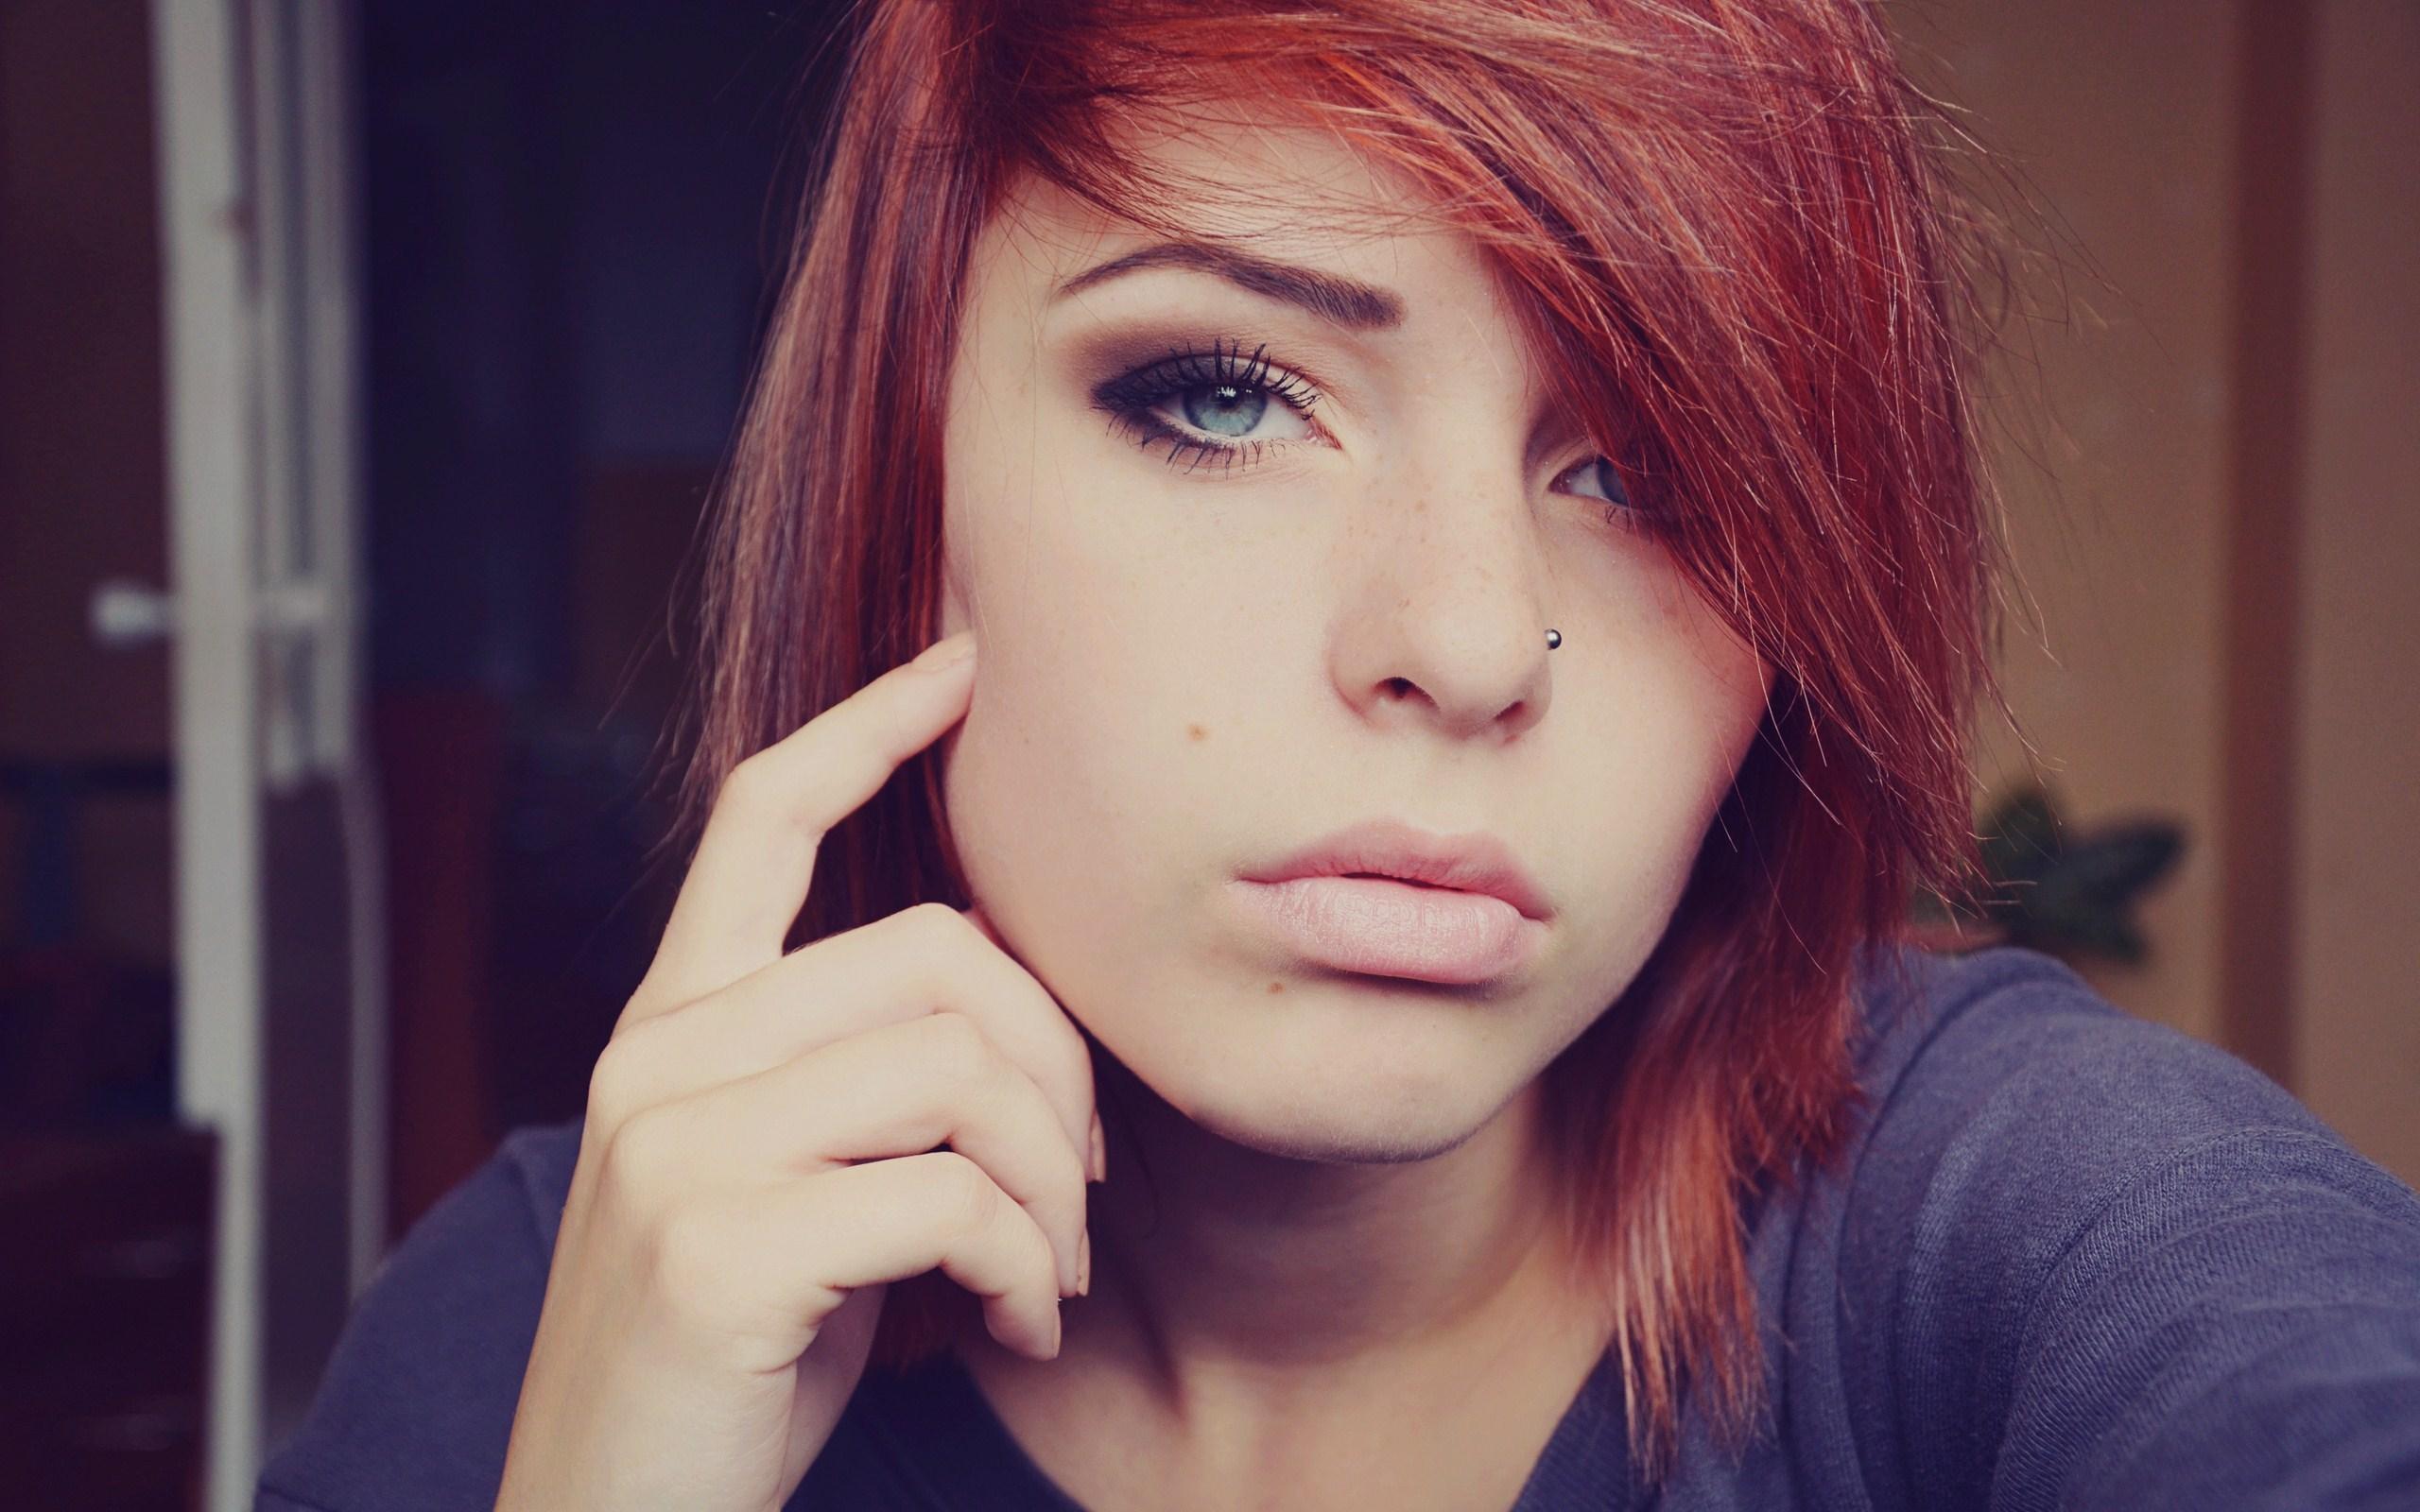 Art Portrait Photo Redhead Girl Close-Up